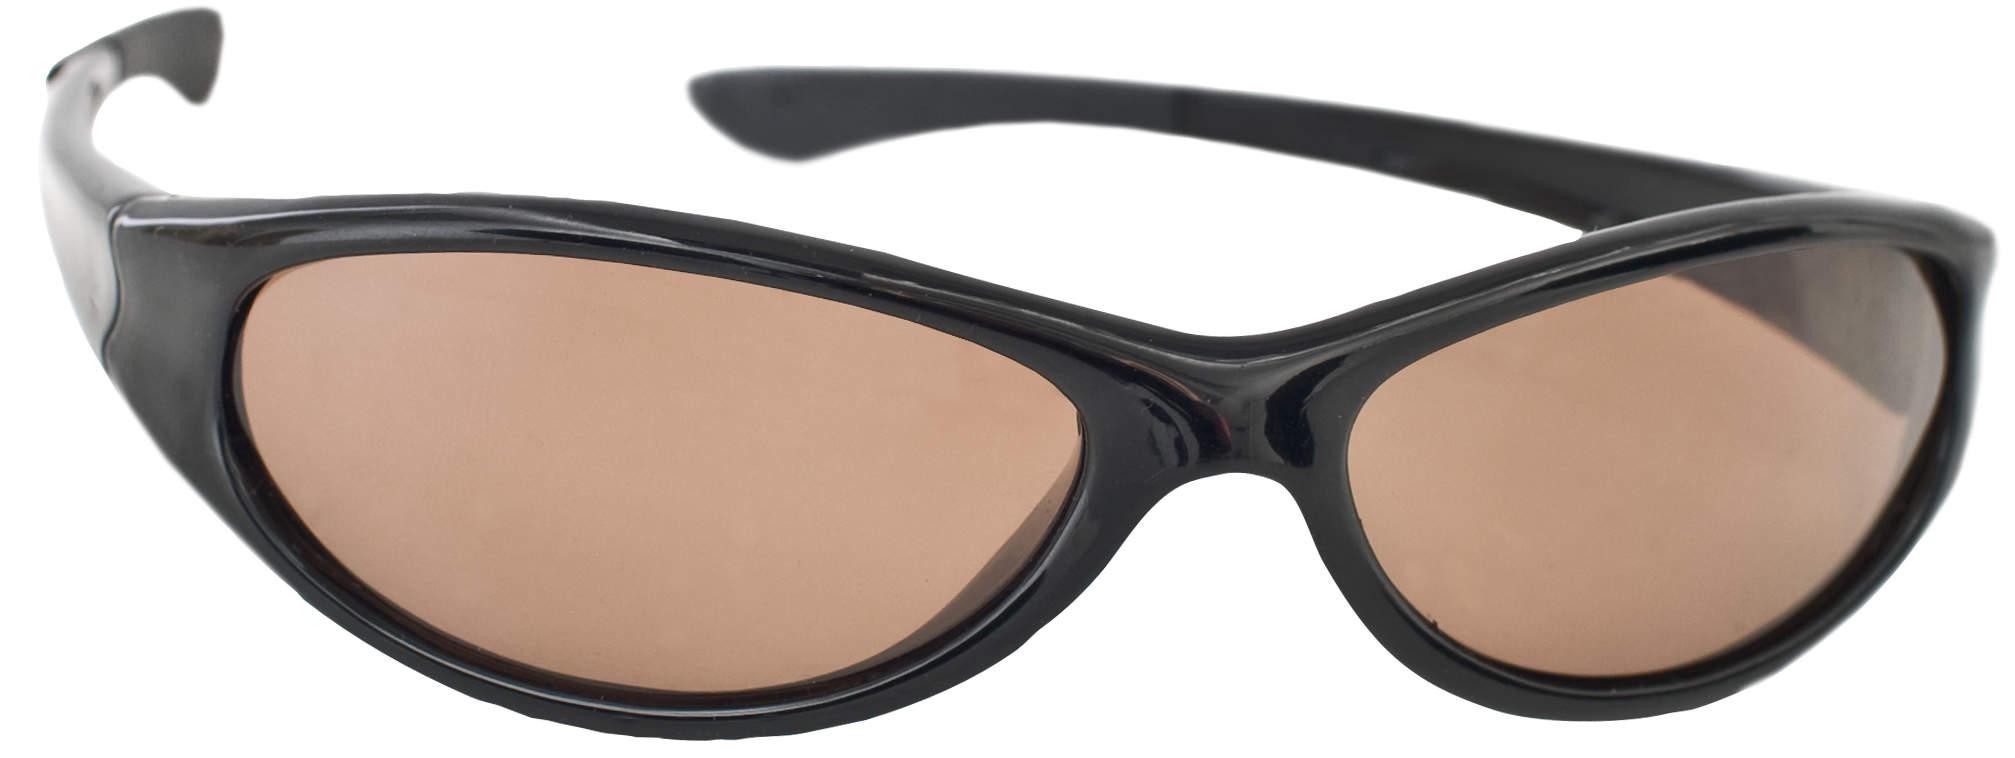 TP394 Trespass Adults Unisex Mass Control Sunglasses